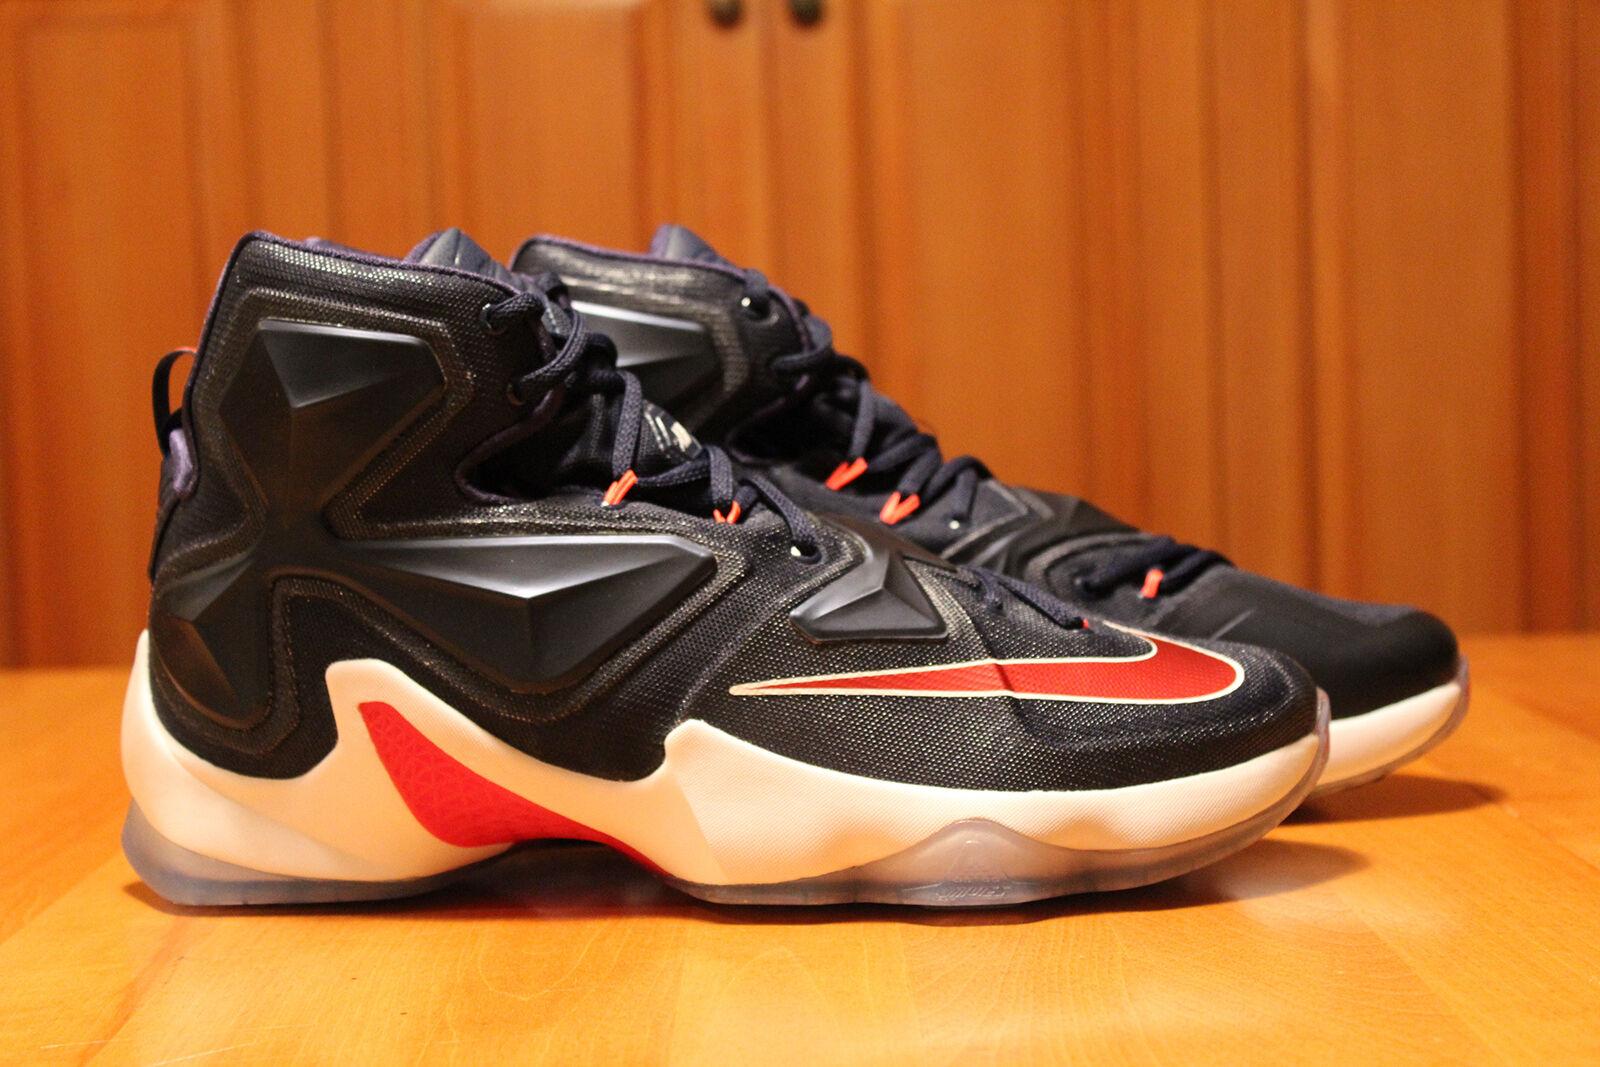 Lebron 13 USA 12 XIII Nike retro DS 12 USA Basketball Shoes 5e7d9d